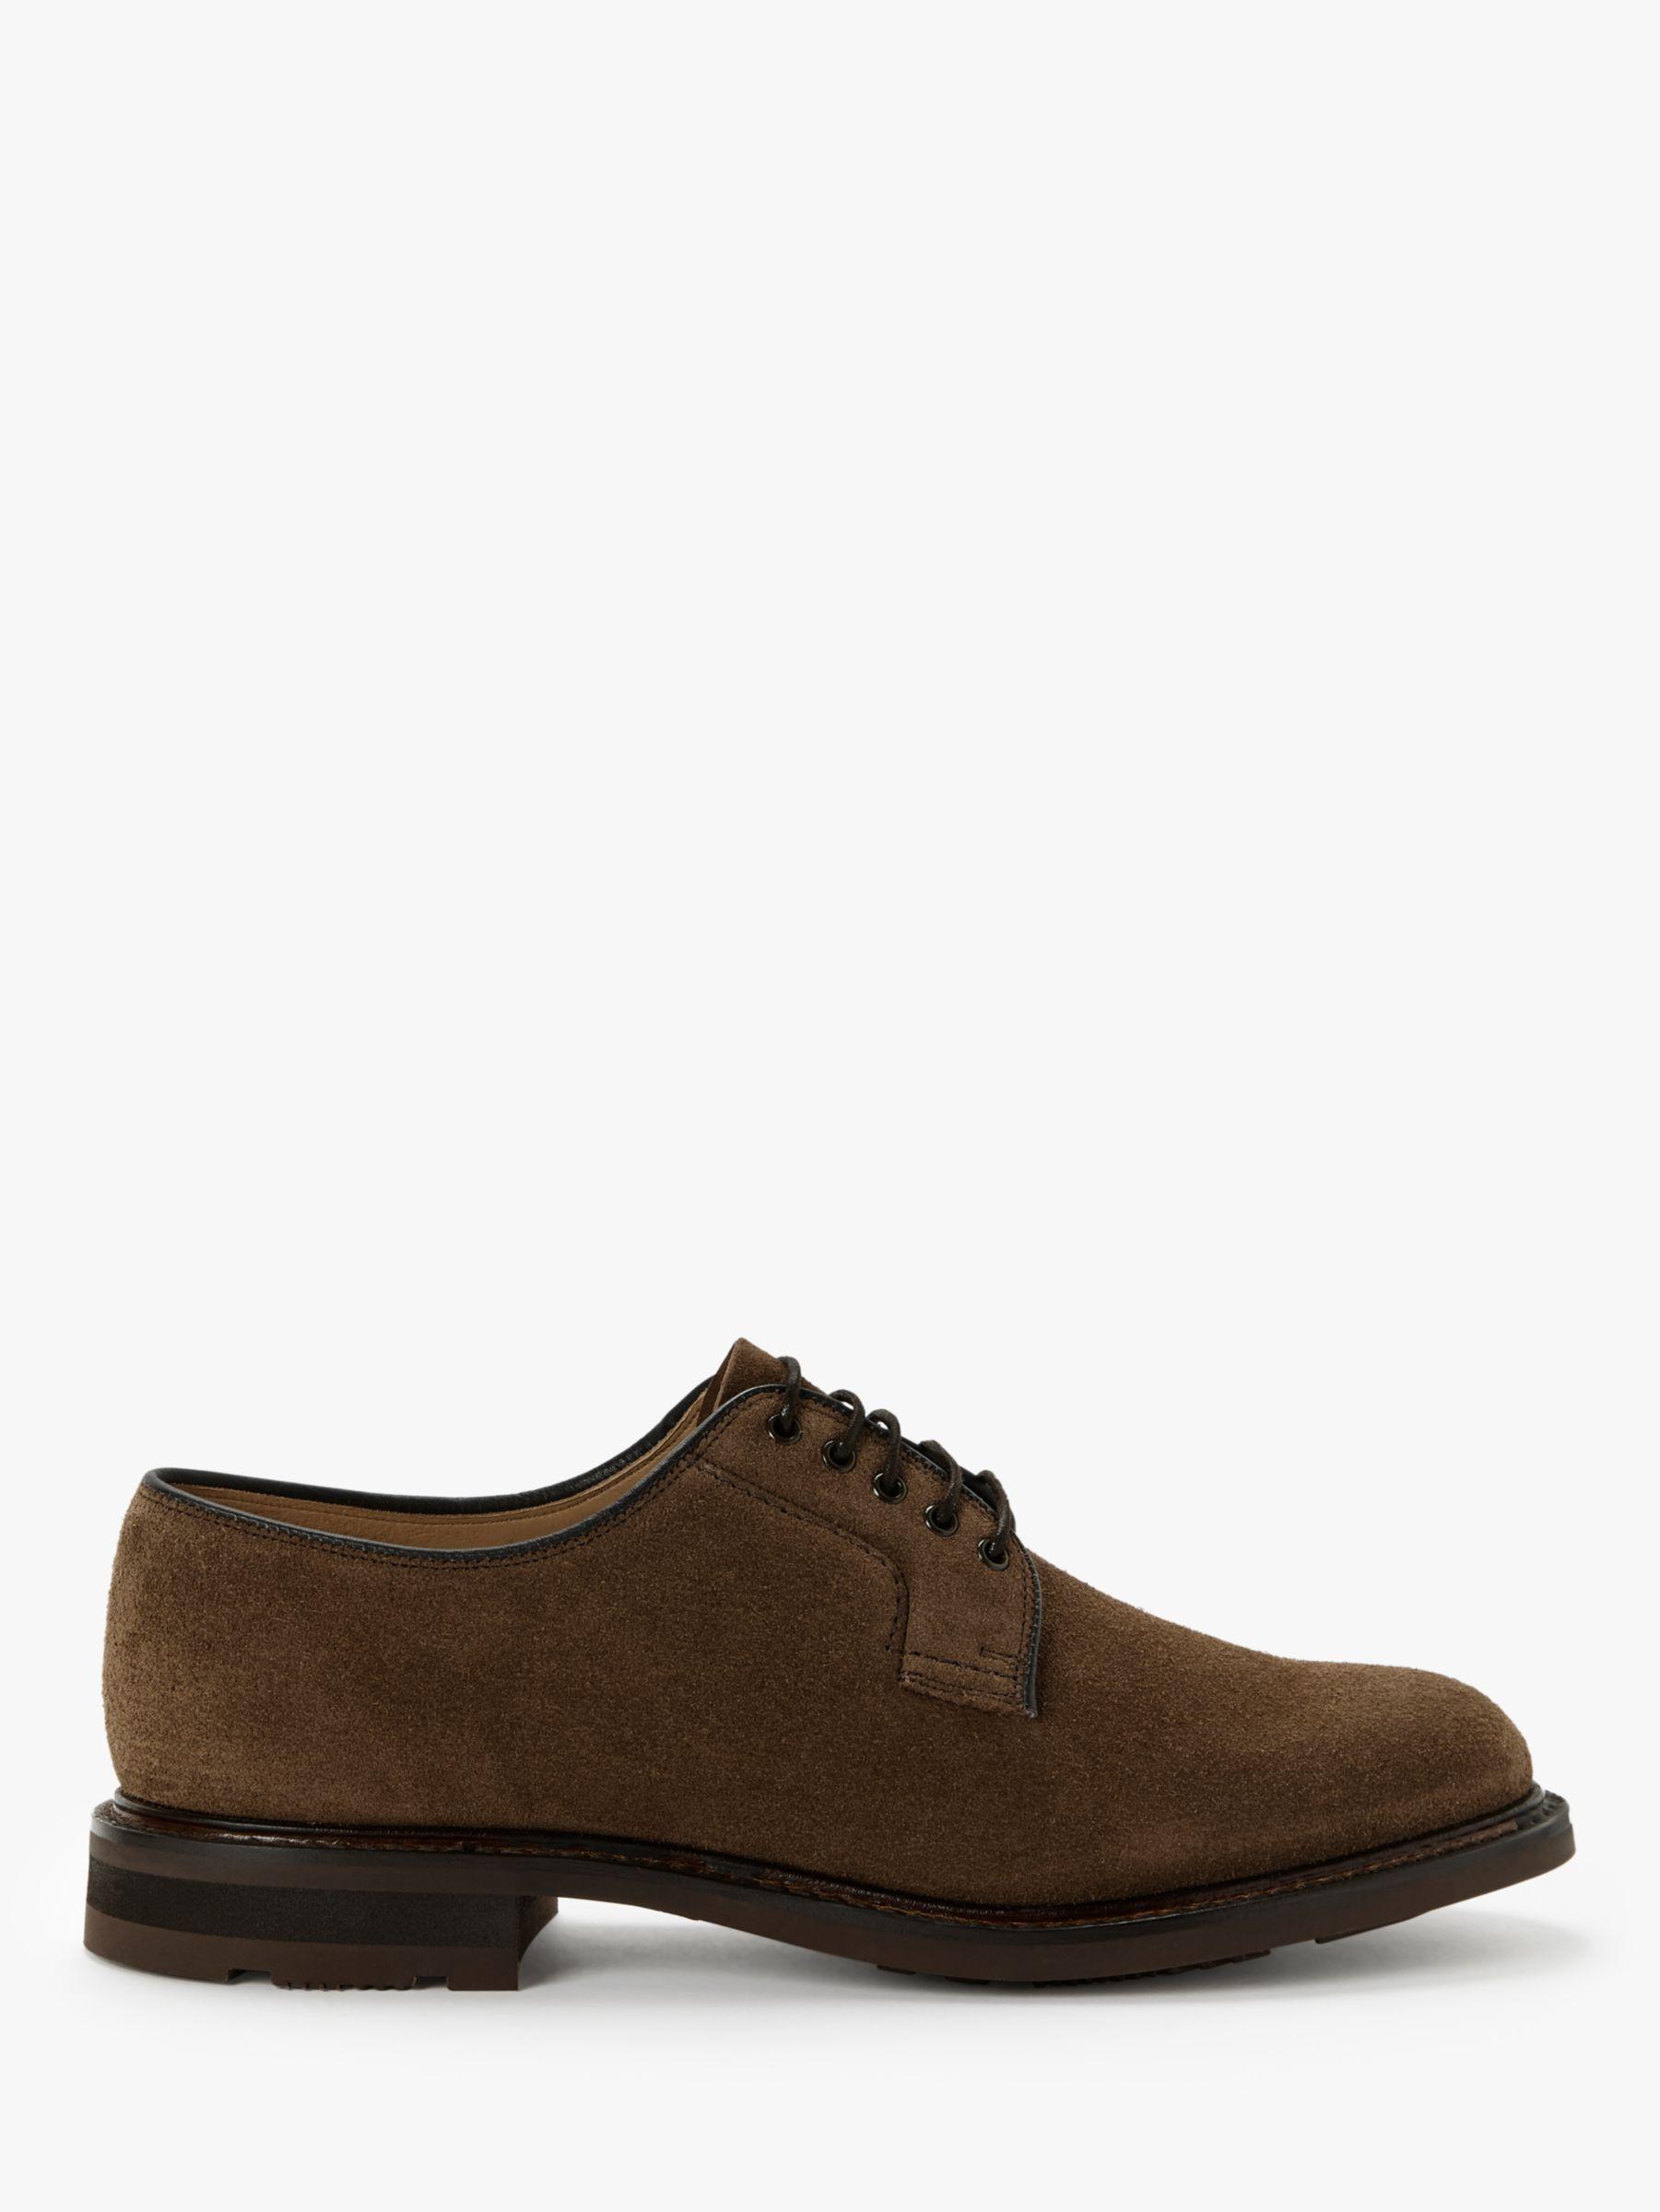 Church's Church's Bestone Suede Derby Shoes, Sigar